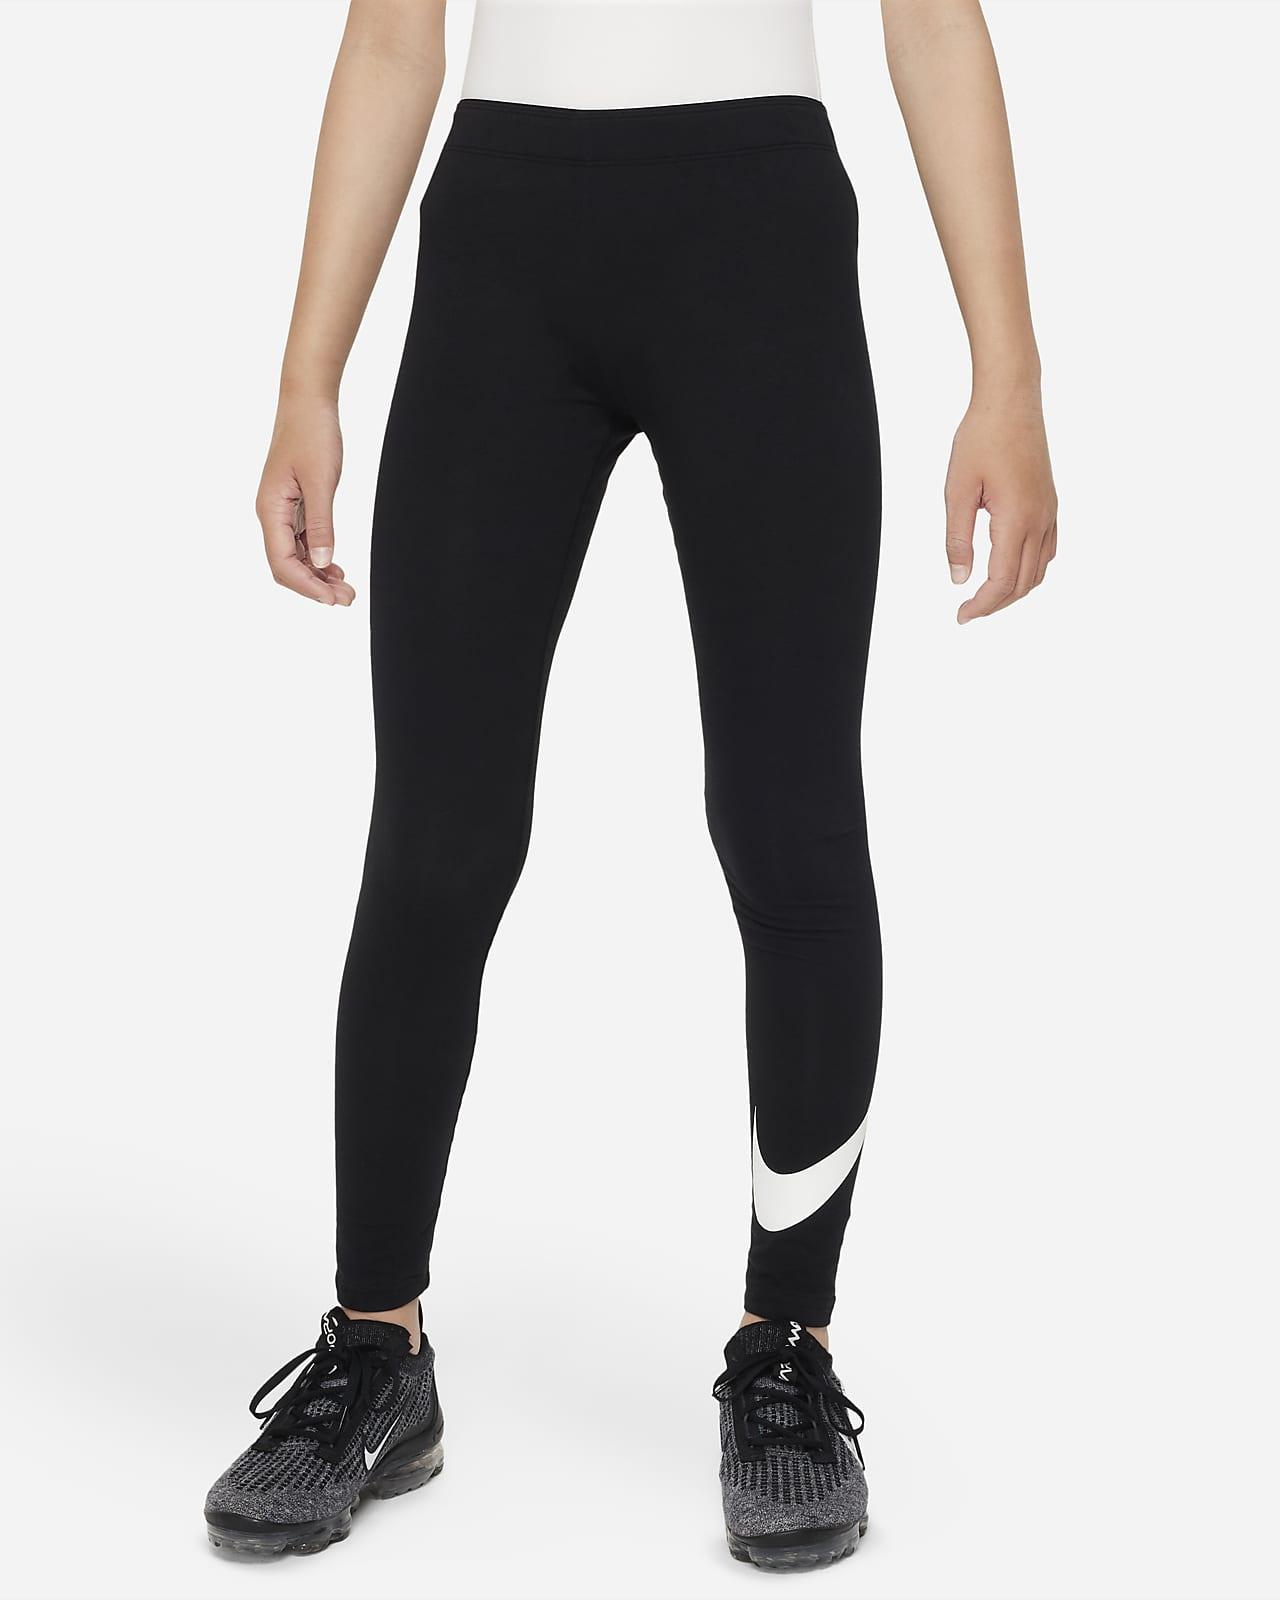 Nike Sportswear Favorites Leggings für ältere Kinder (Mädchen)